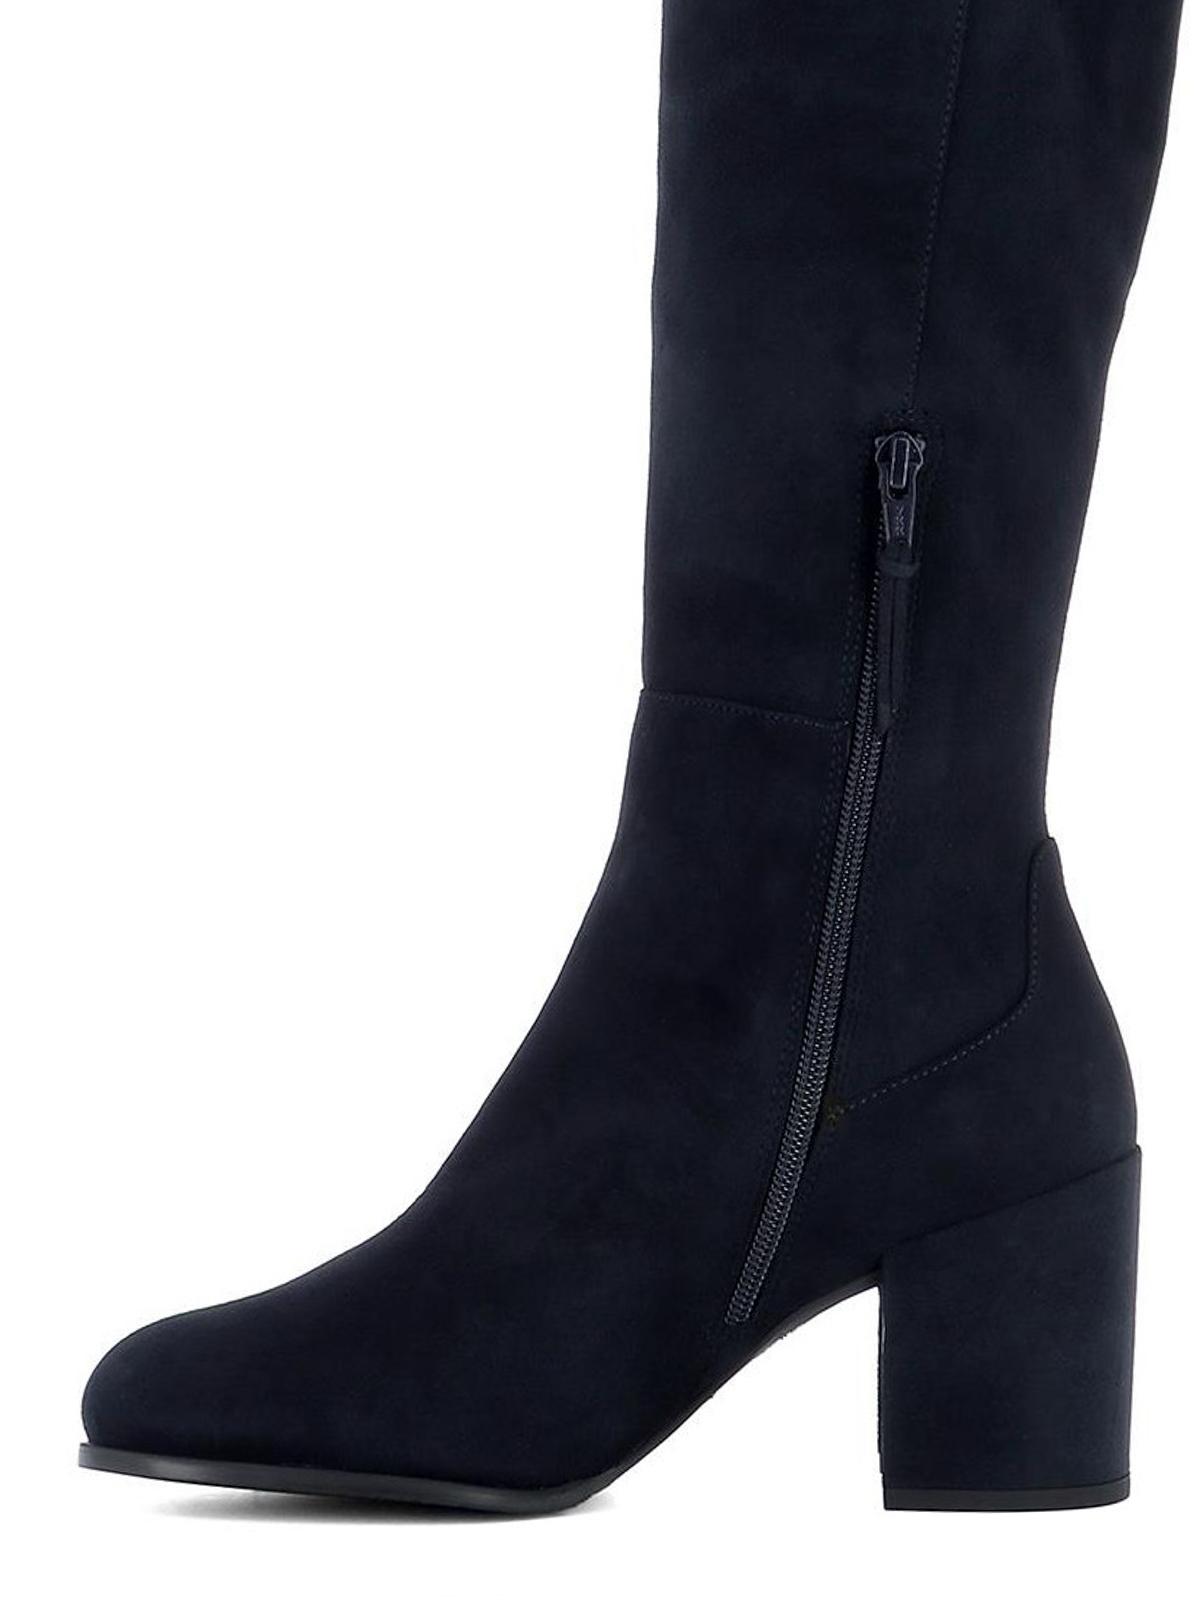 Stuart Weitzman Alljack Suede Boots Boots